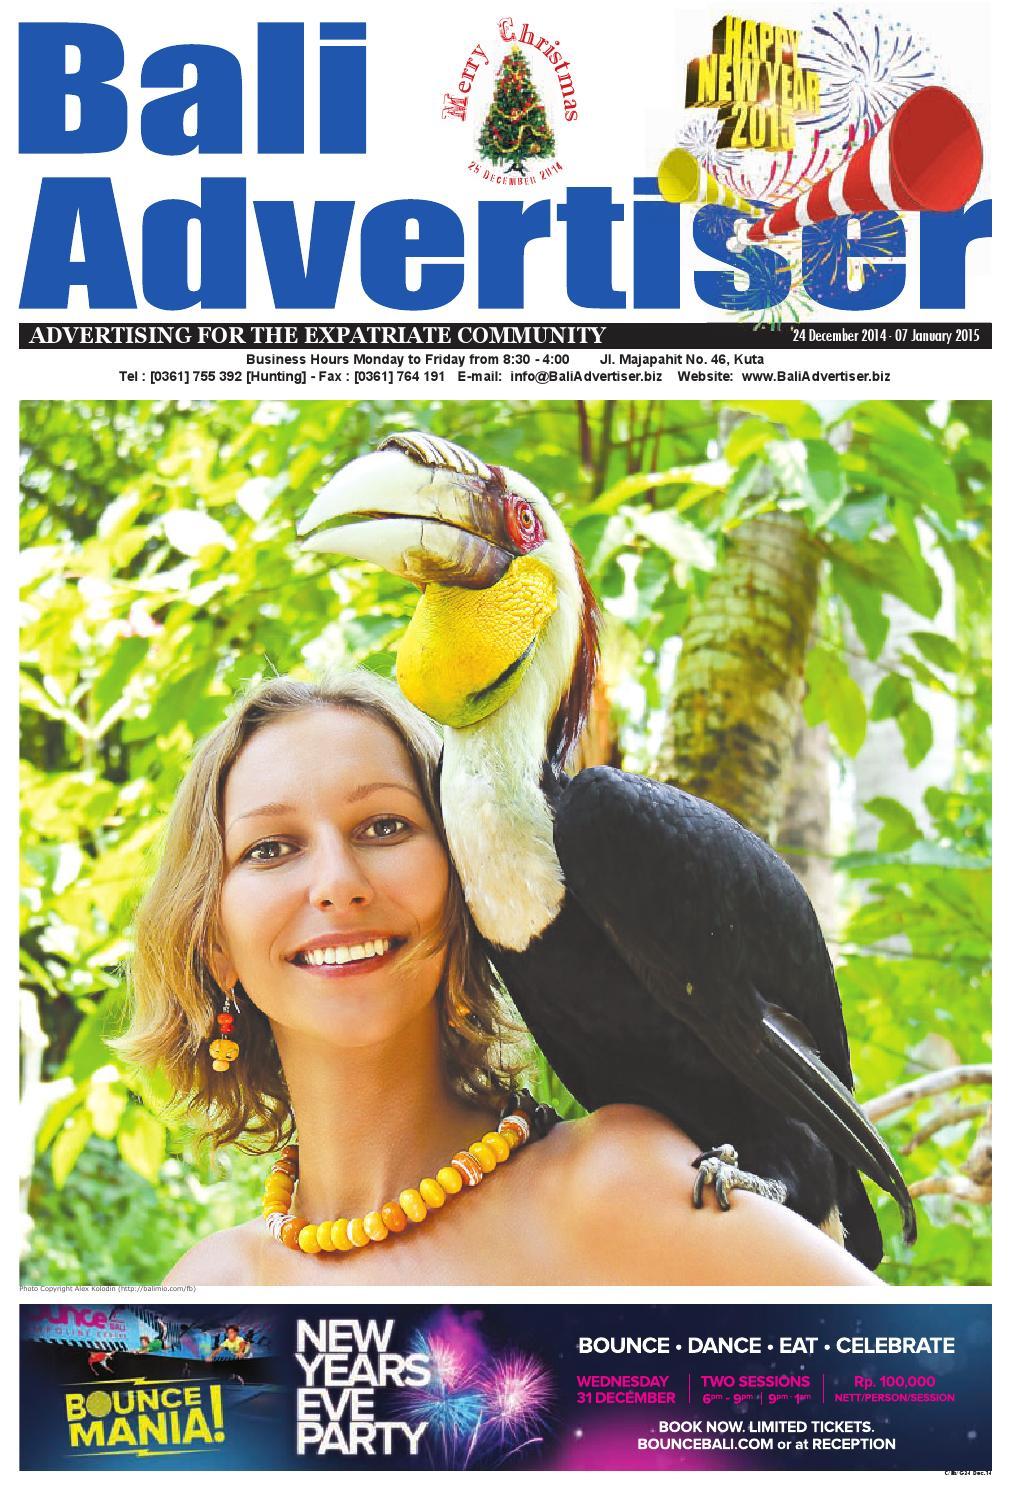 BA 24 December 2014 By Bali Advertiser